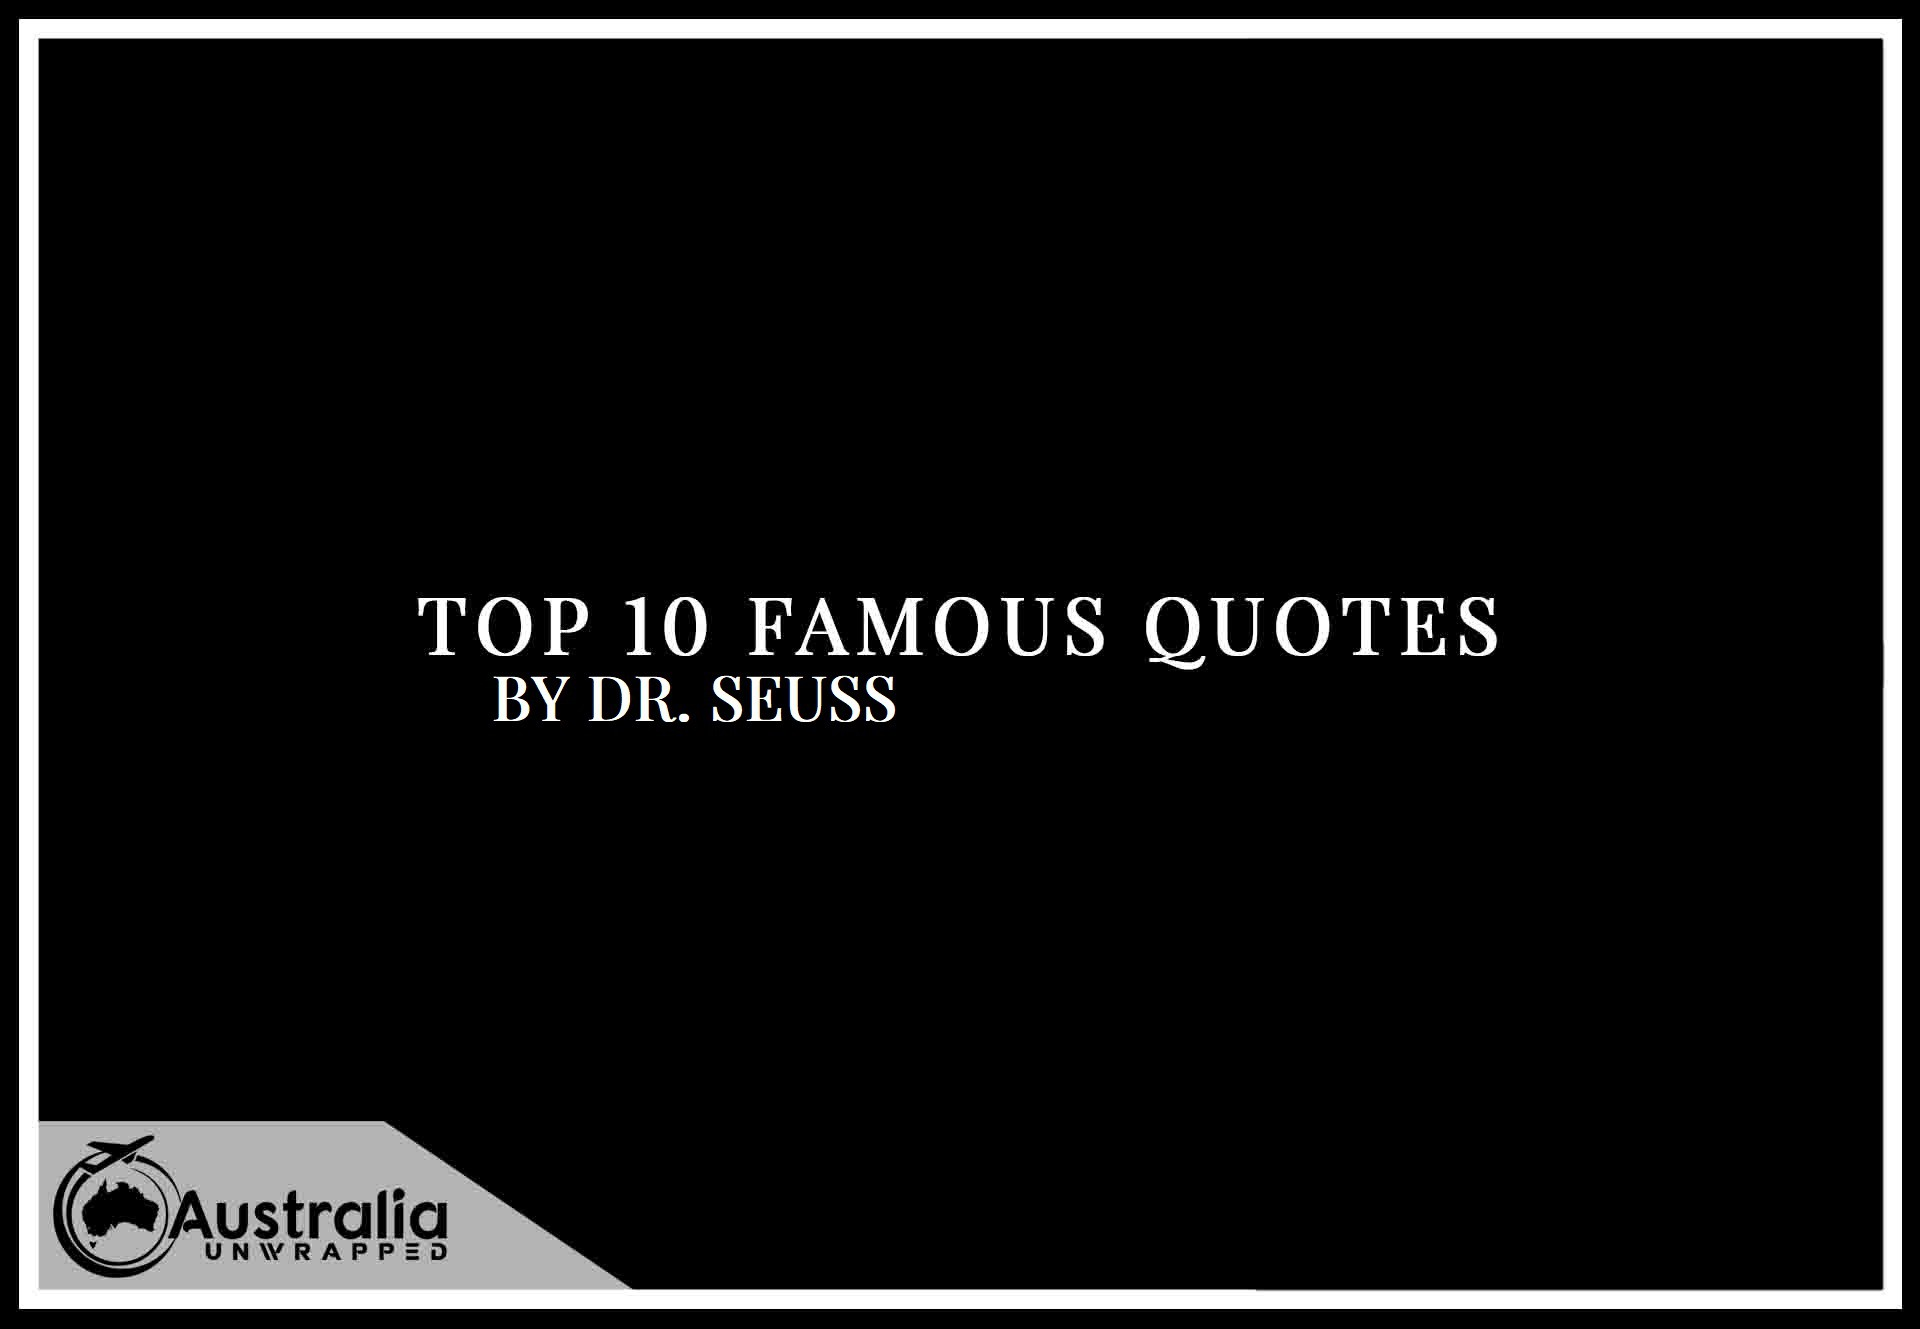 Top 10 Famous Quotes by Author Dr. Seuss